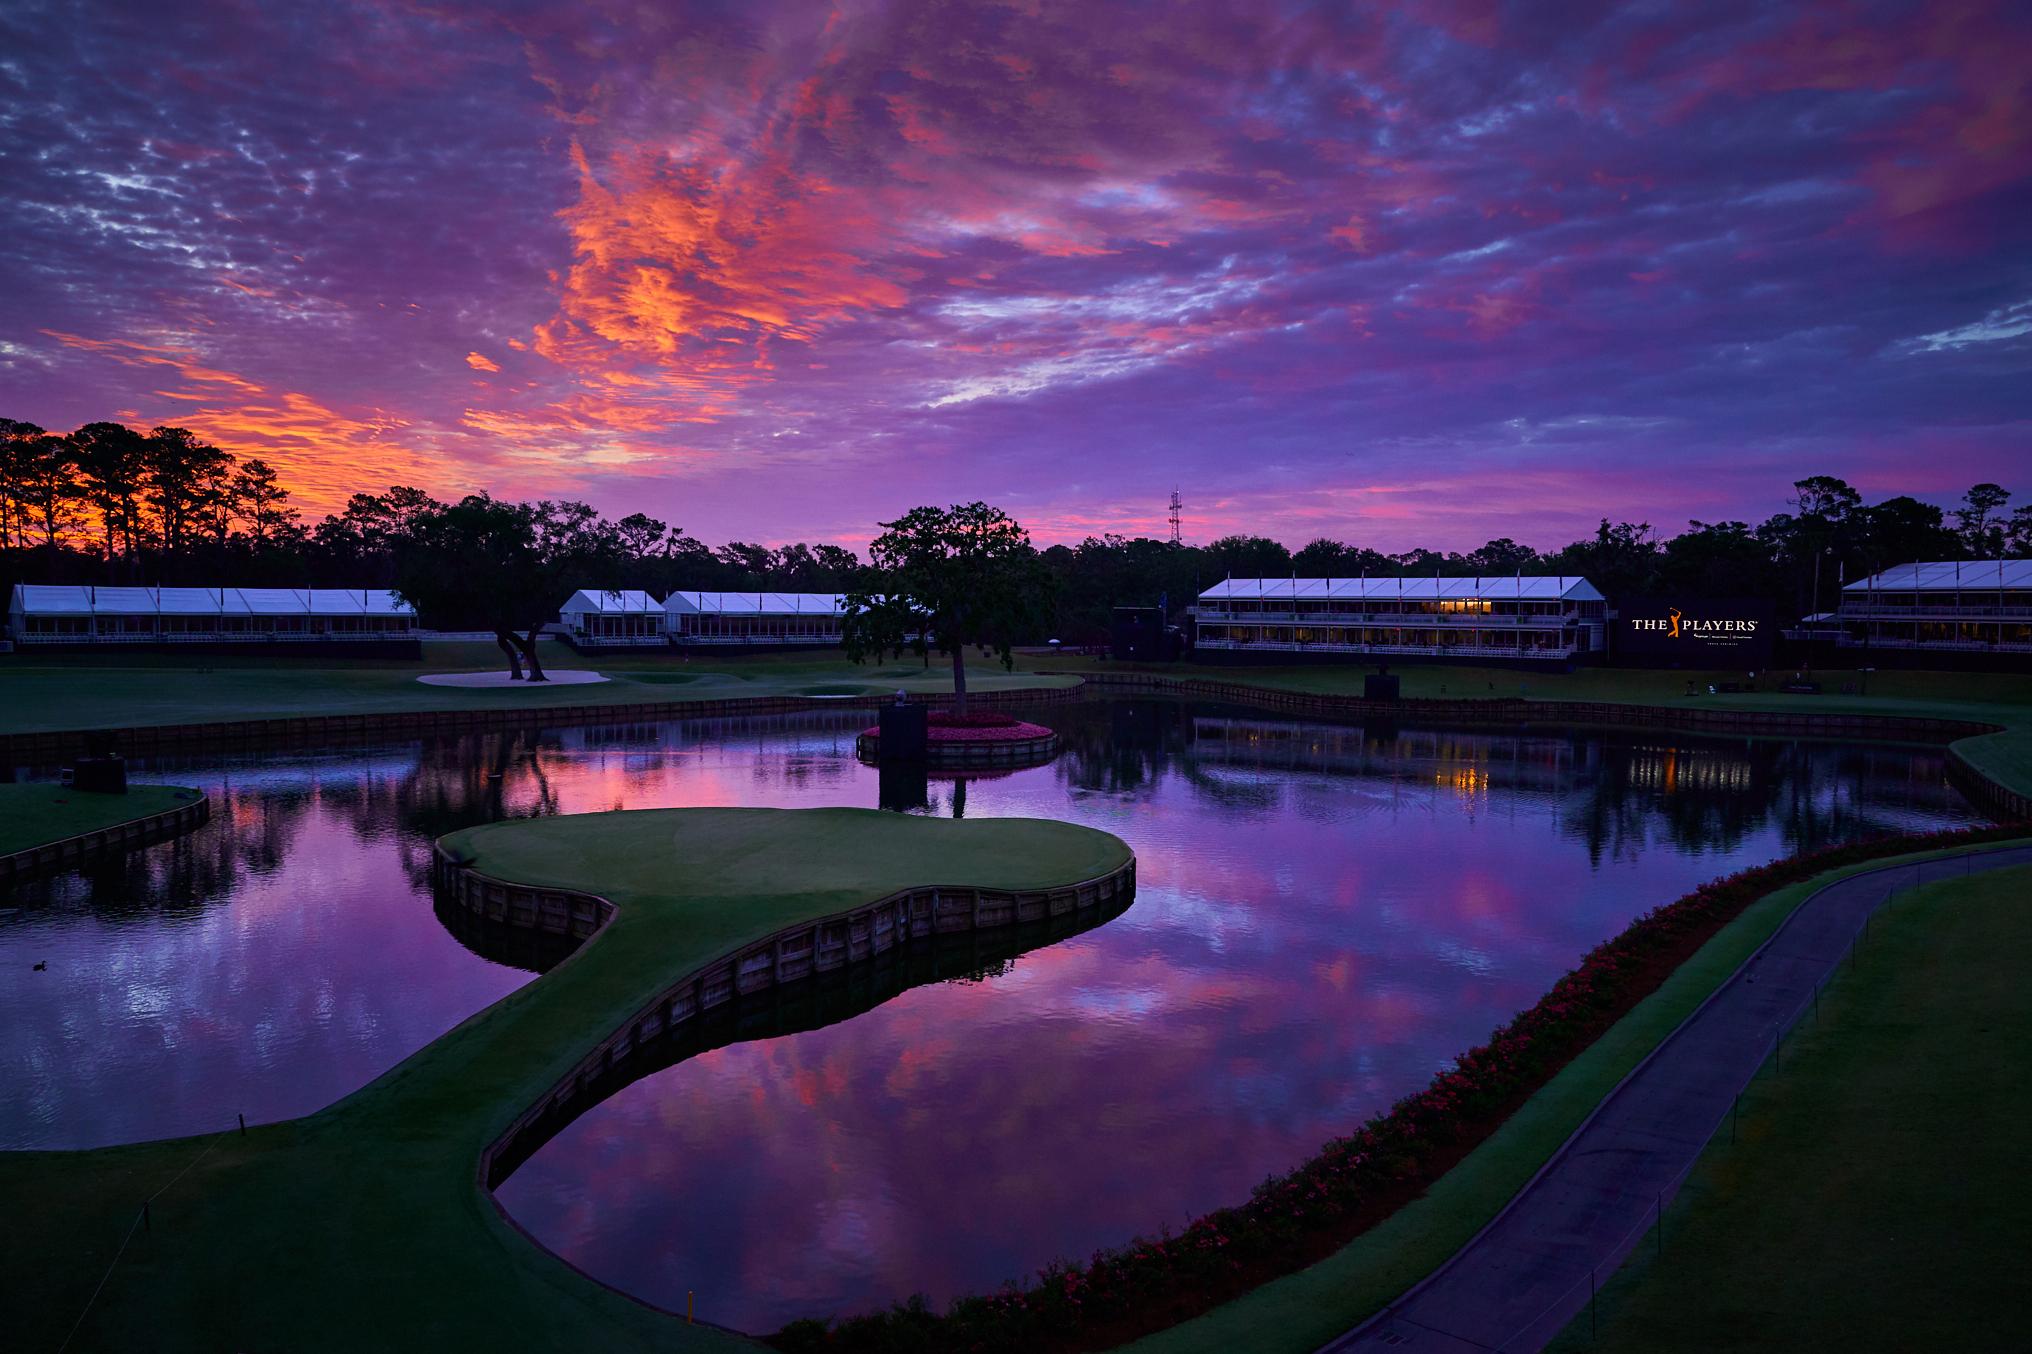 17th green, 2018 Players Championship. .  TPC Sawgrass, Ponte Vedra Beach, Florida. Sony A9, Sony 24-70mm f2.8 G-Master